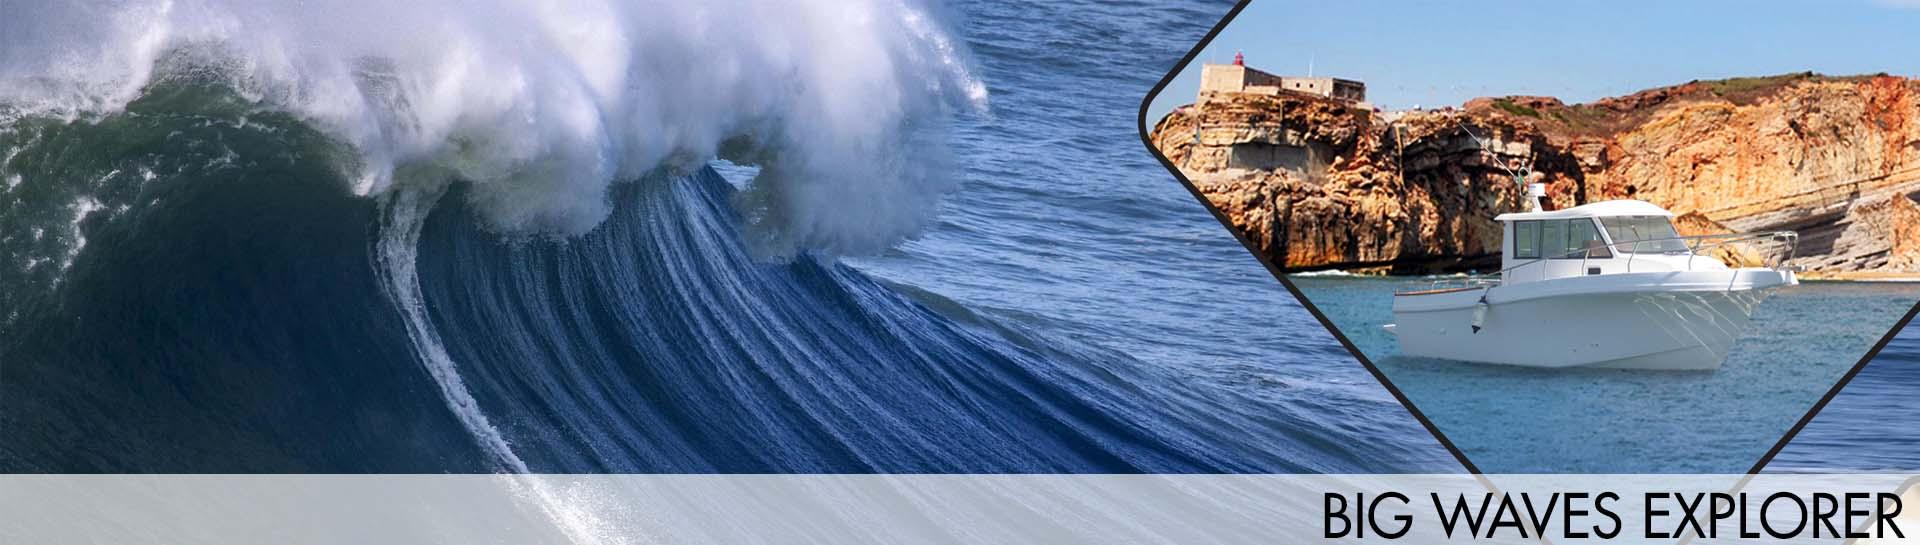 BIG WAVES EXPLORER